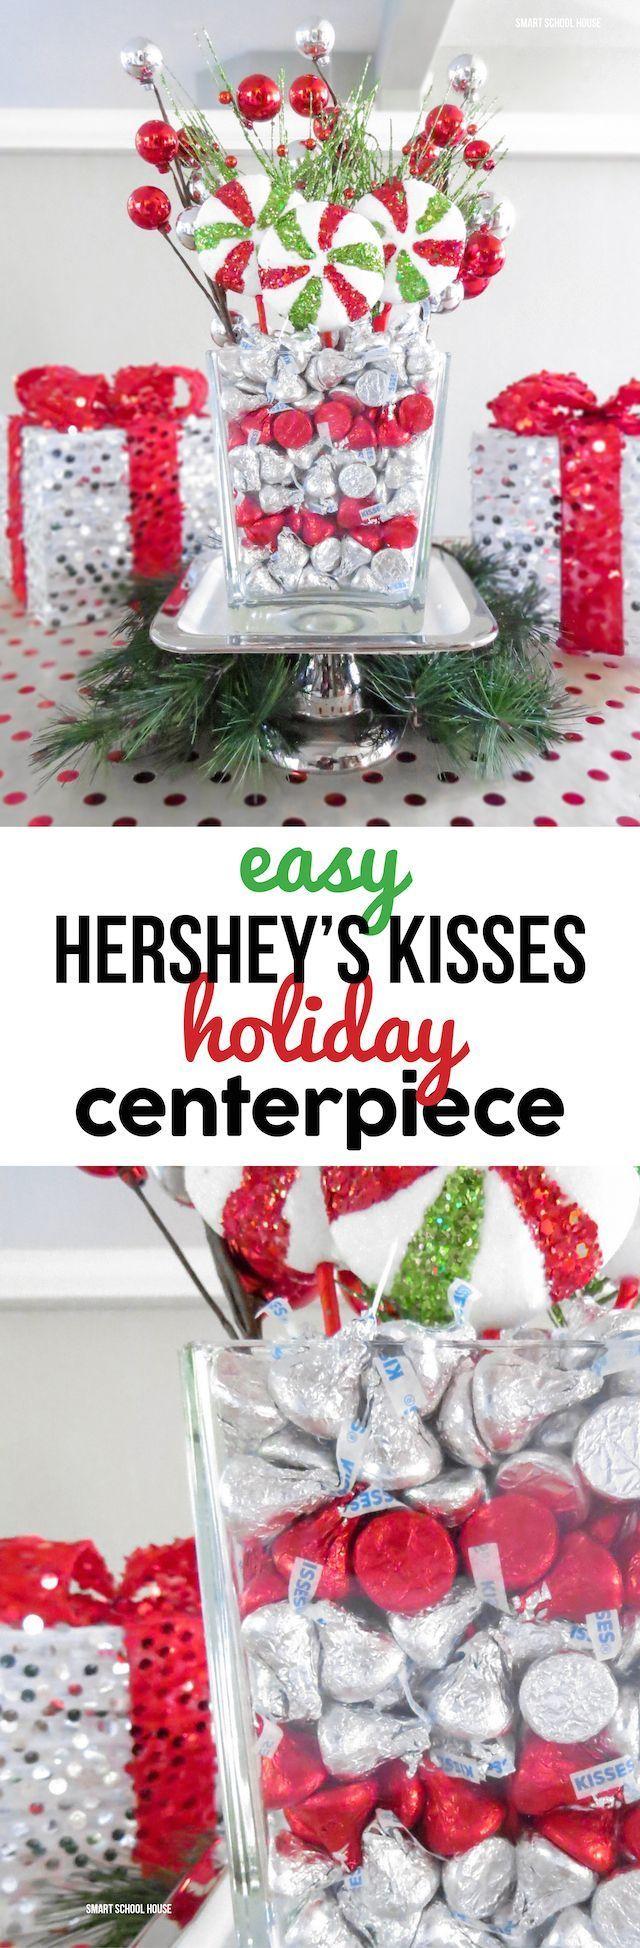 how to make hershey kisses